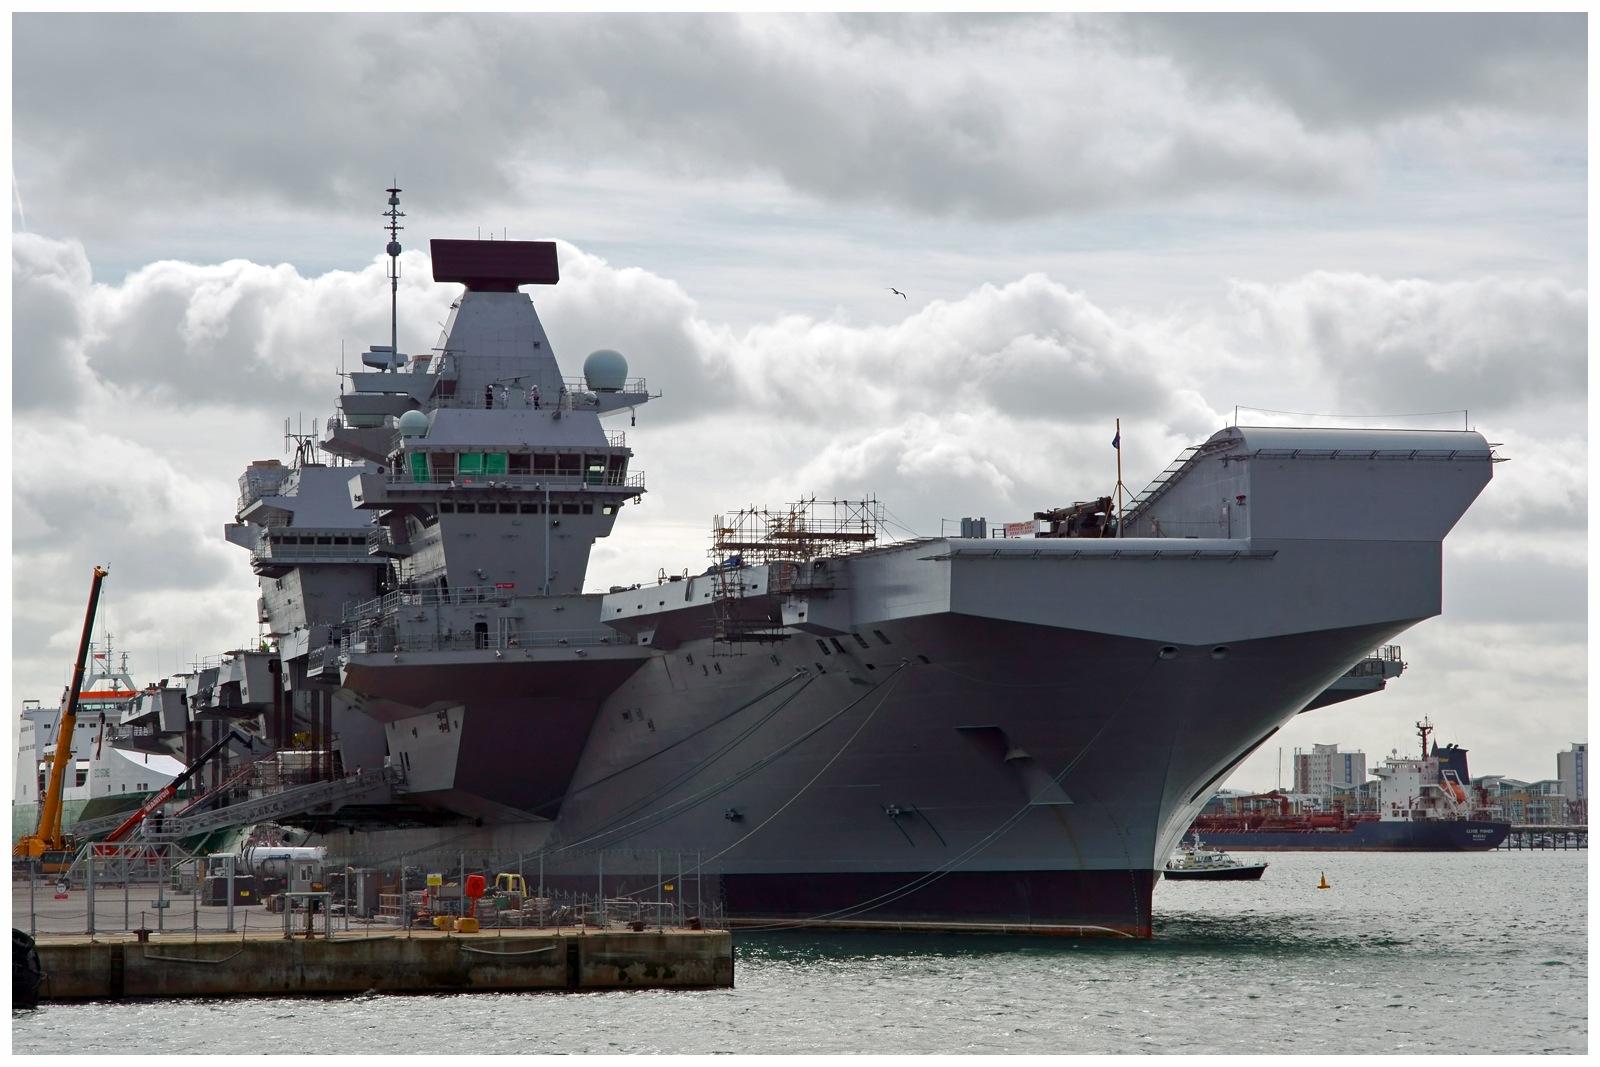 Warship by tpthornton